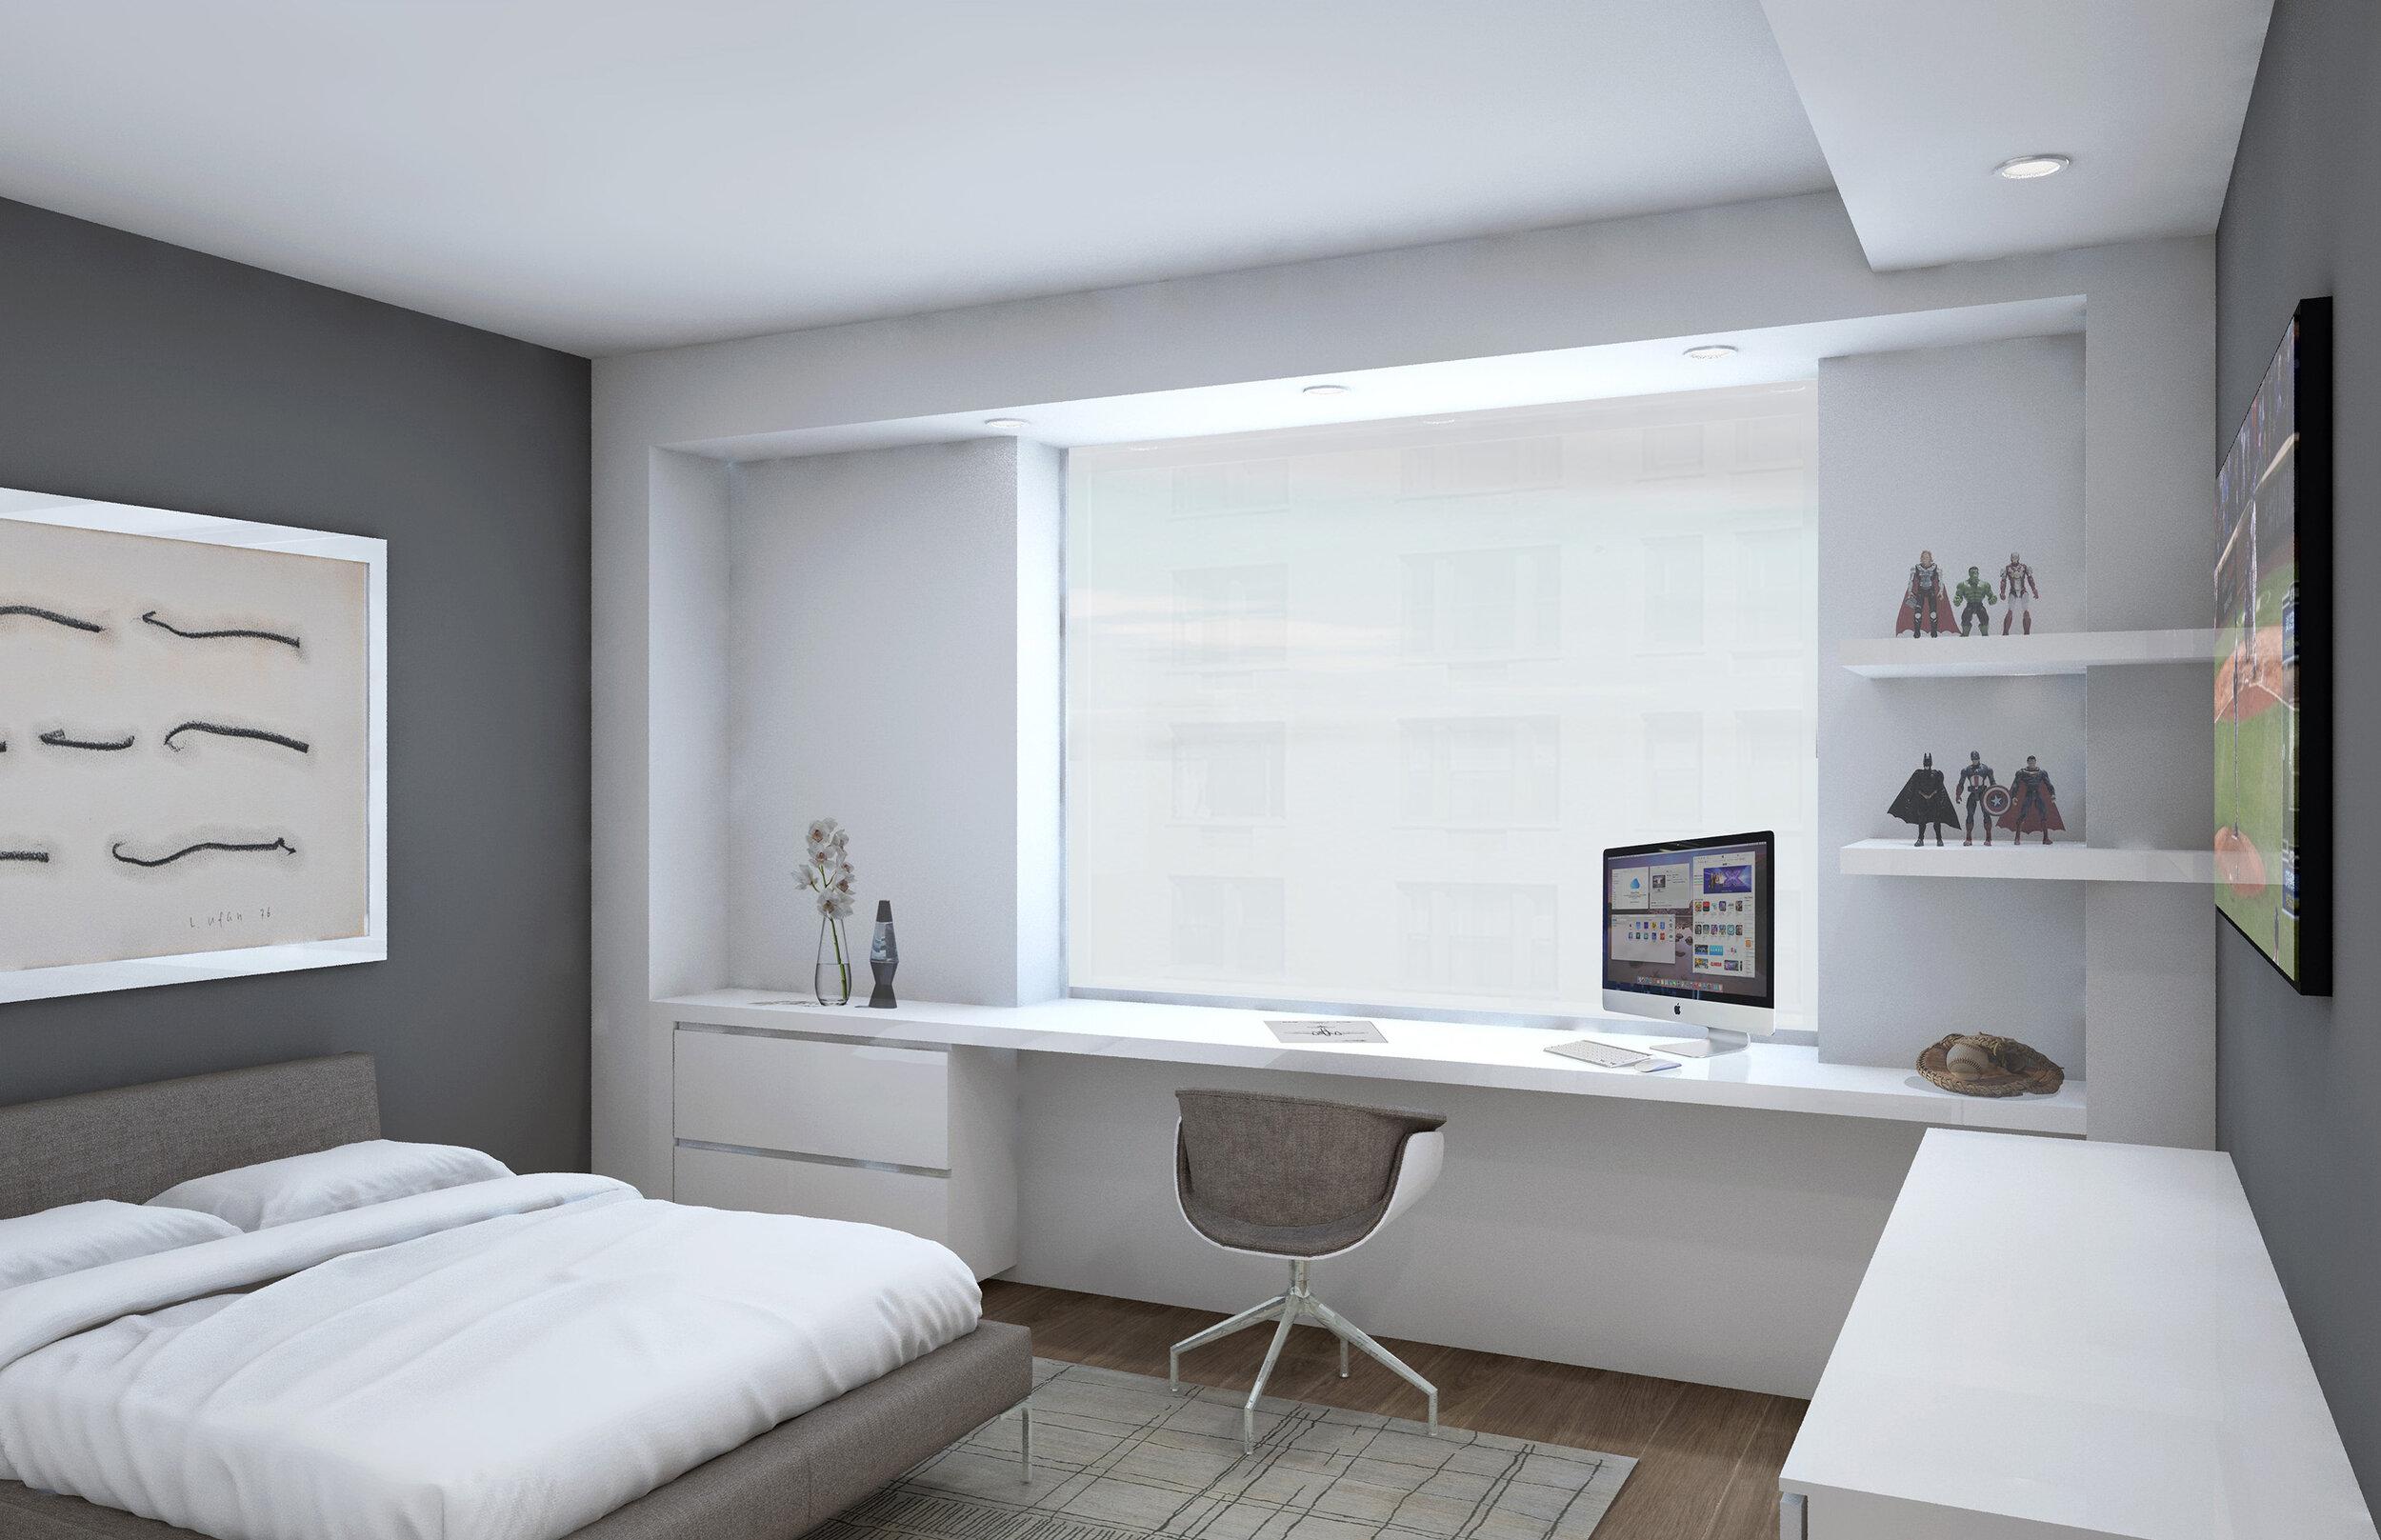 8_Bedroom #1 (3)_FLAT.jpg